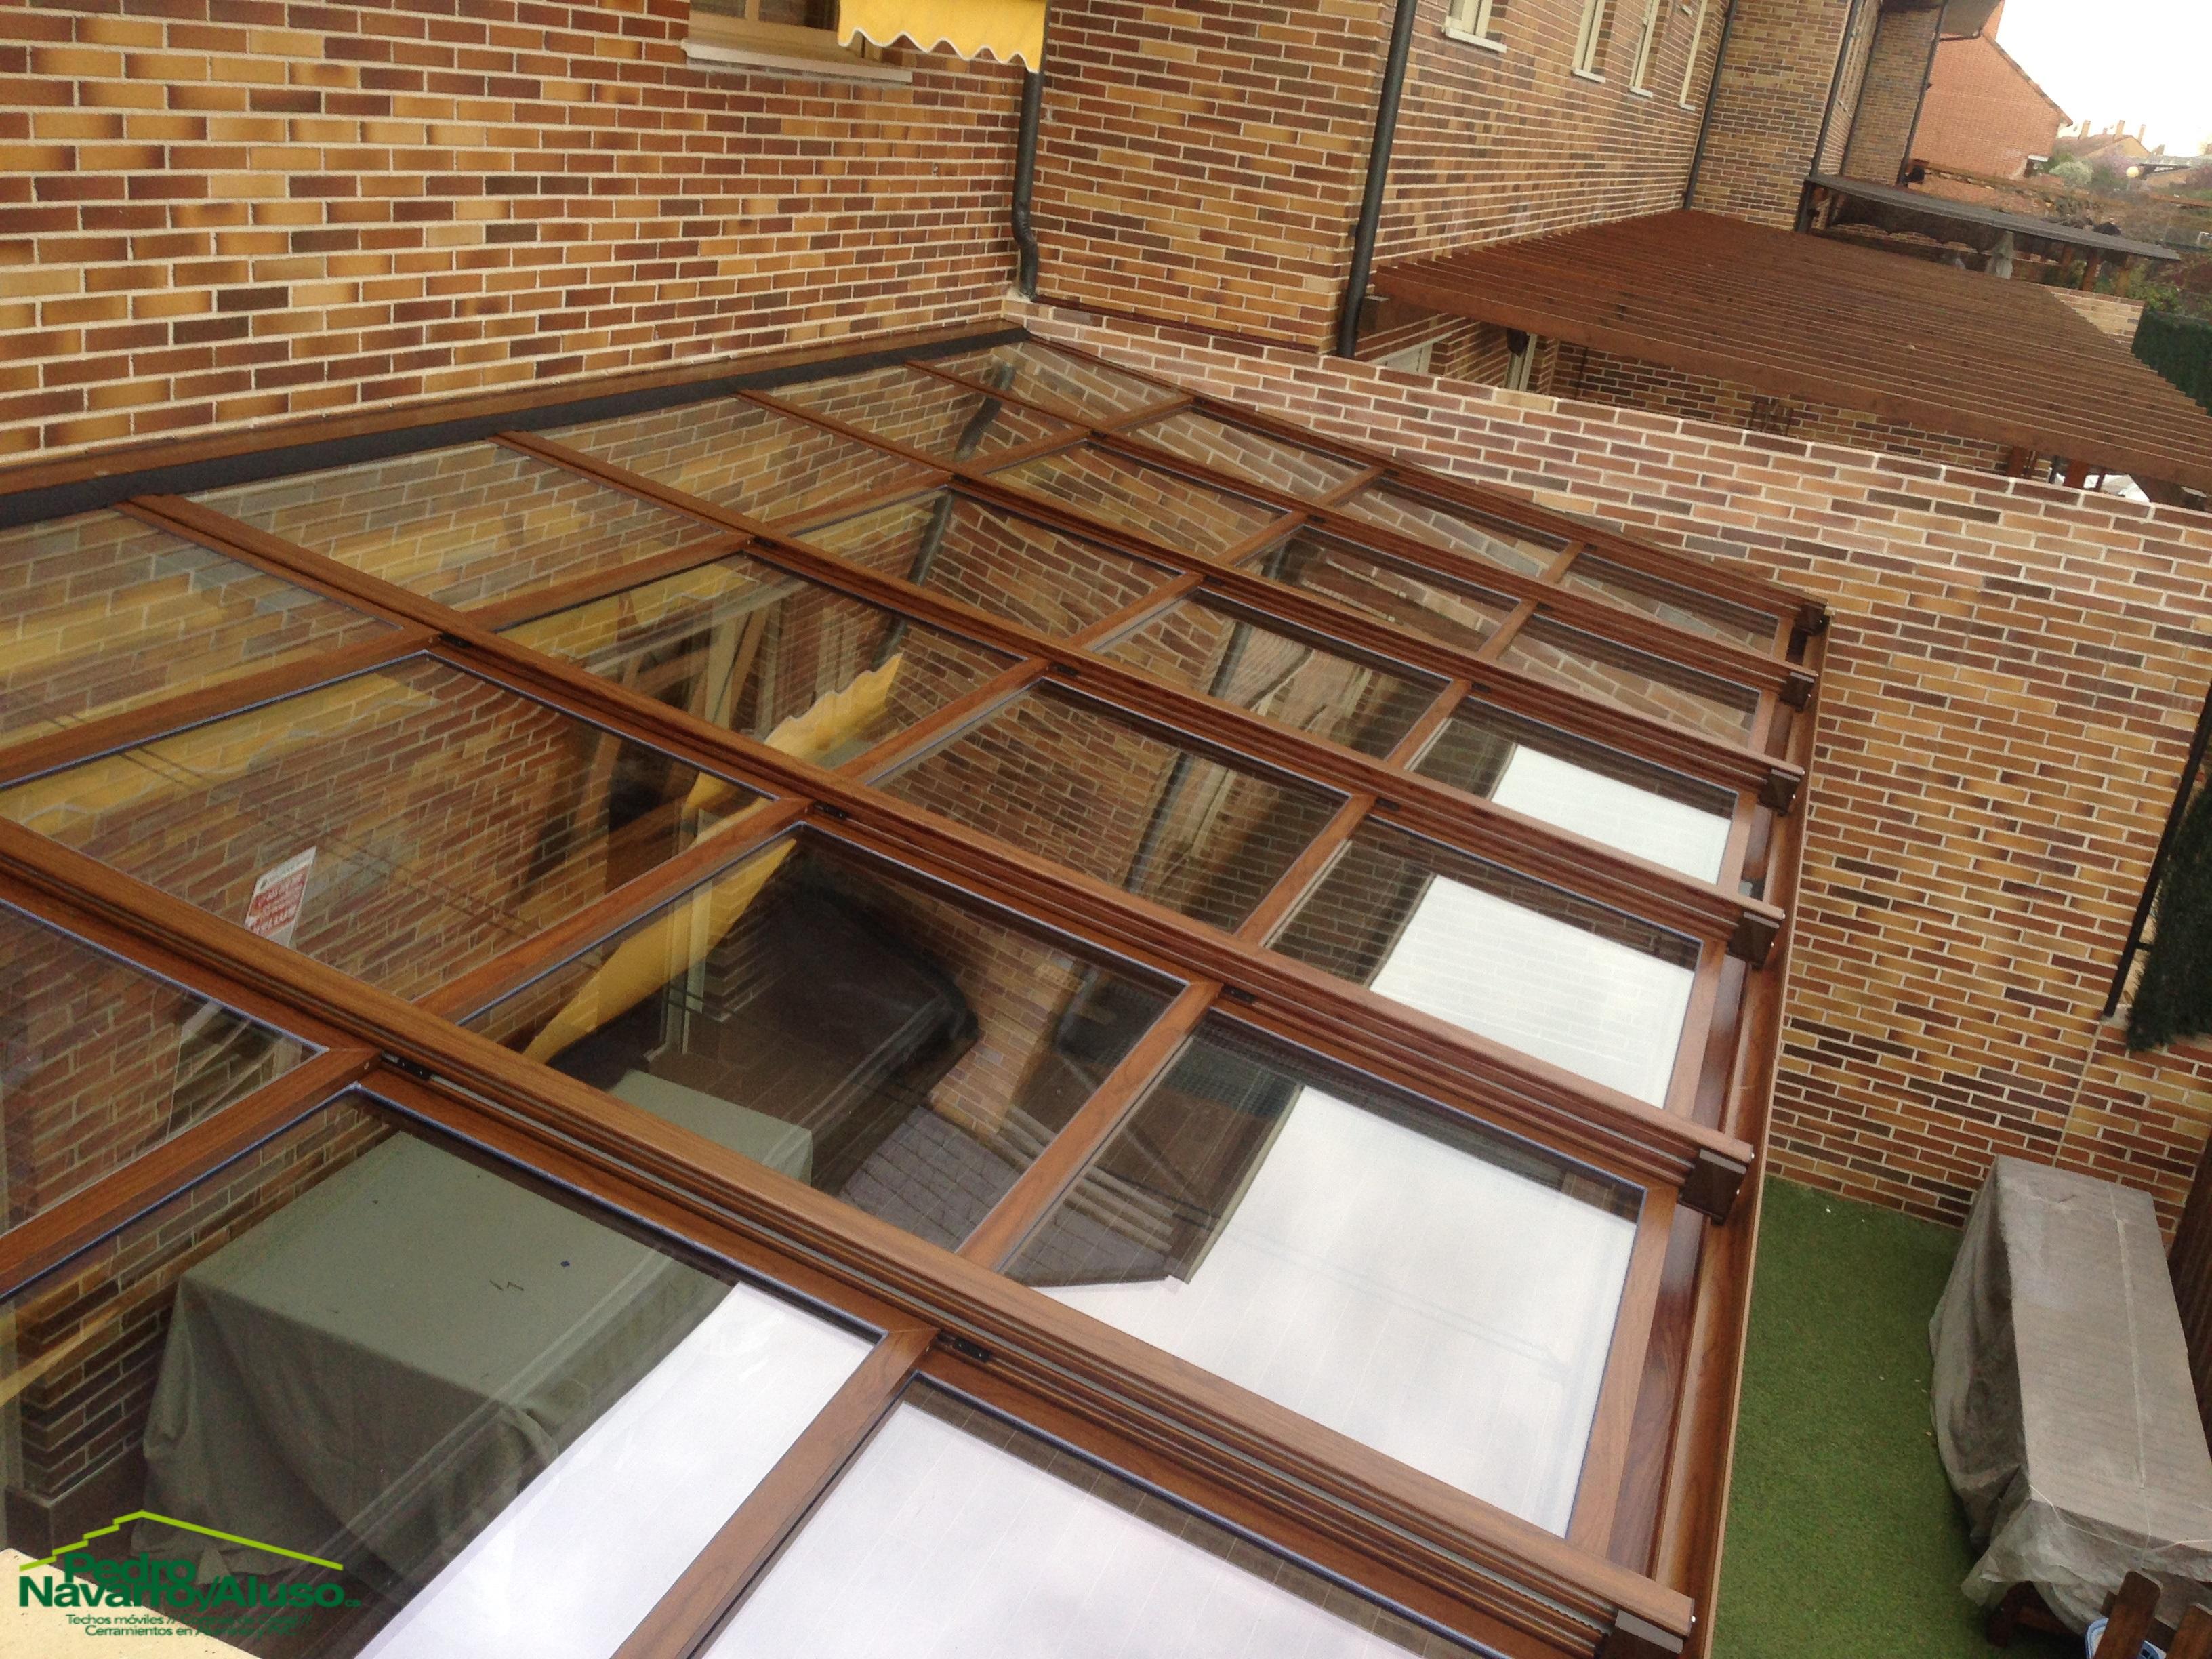 techo-movil-vidrio-control-solar-motorizado-imitacion-madera-8